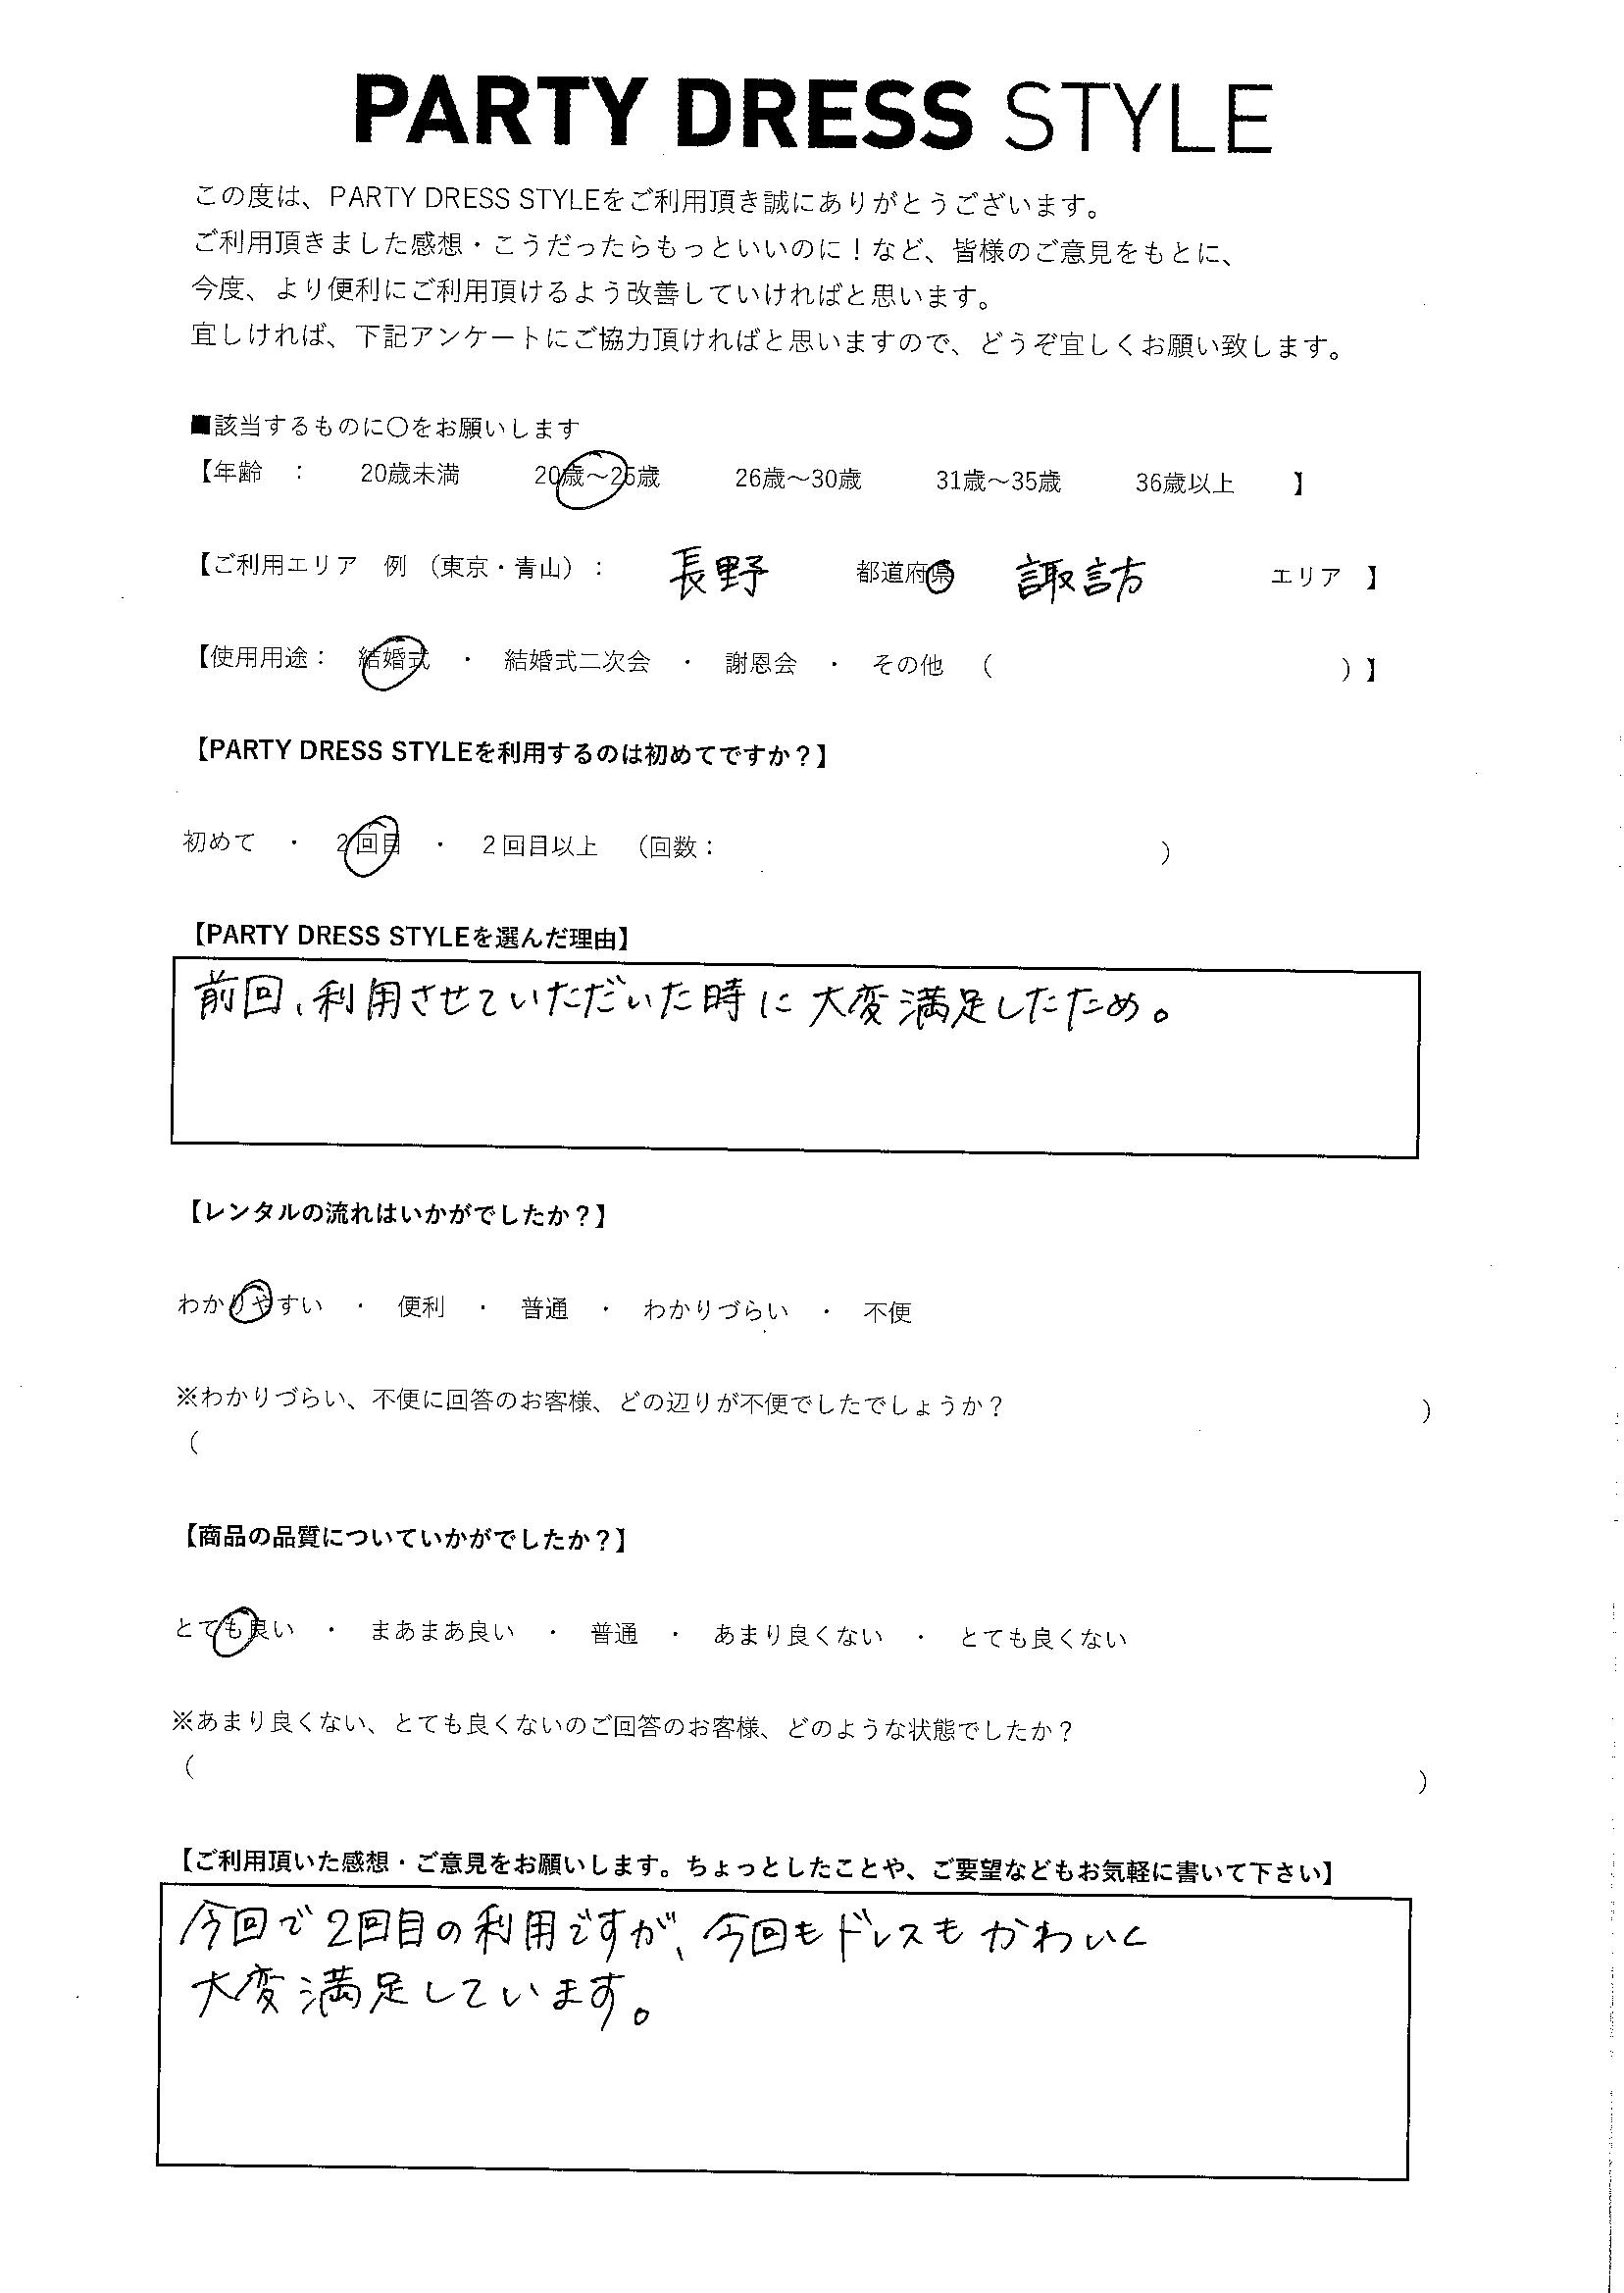 5/17結婚式利用 長野県・諏訪エリア